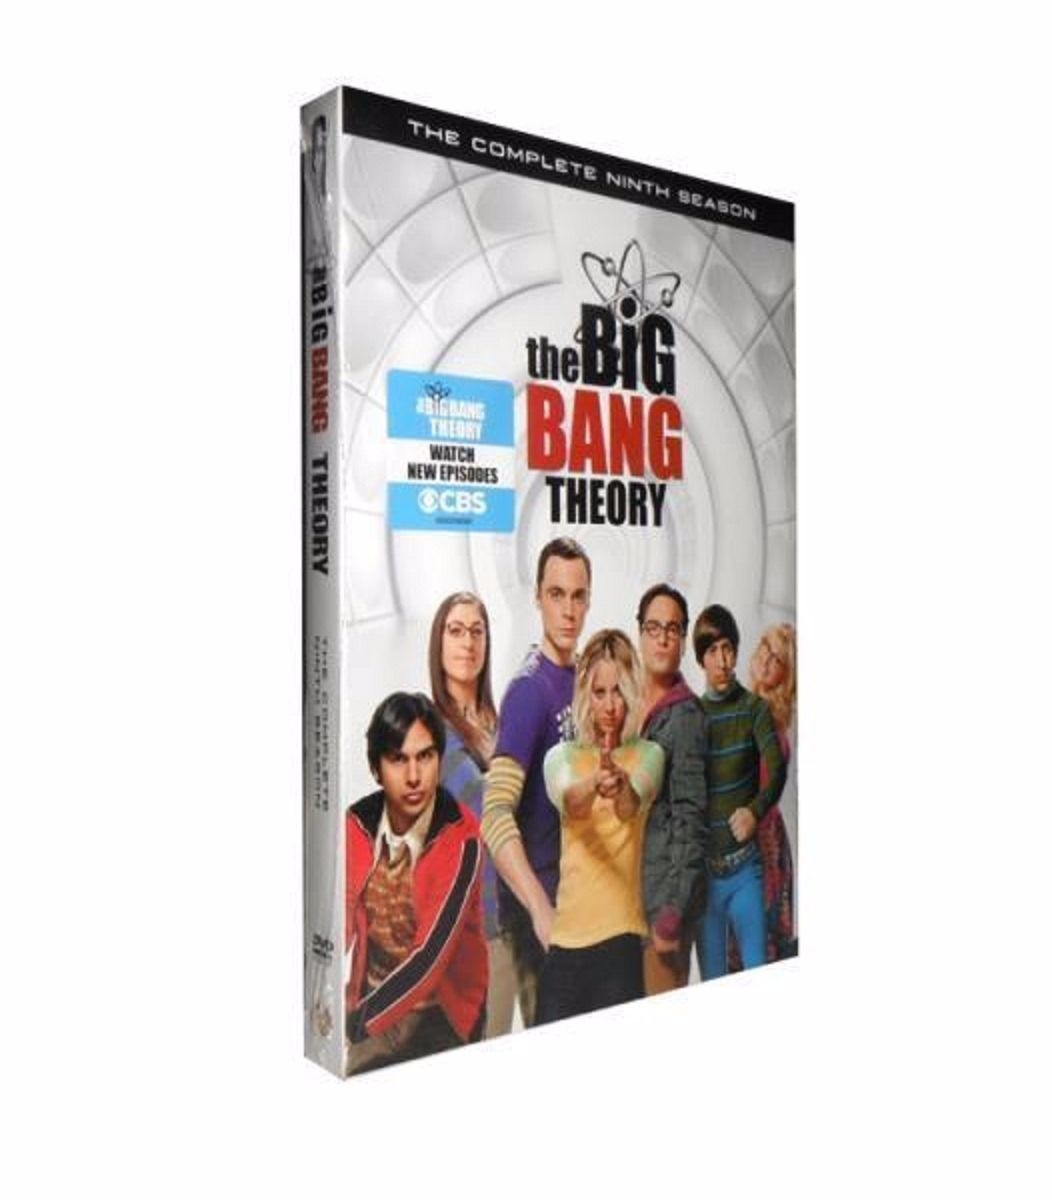 The Big Bang Theory: The Complete Ninth Season 9 (DVD 3-Disc Set) TV Series New